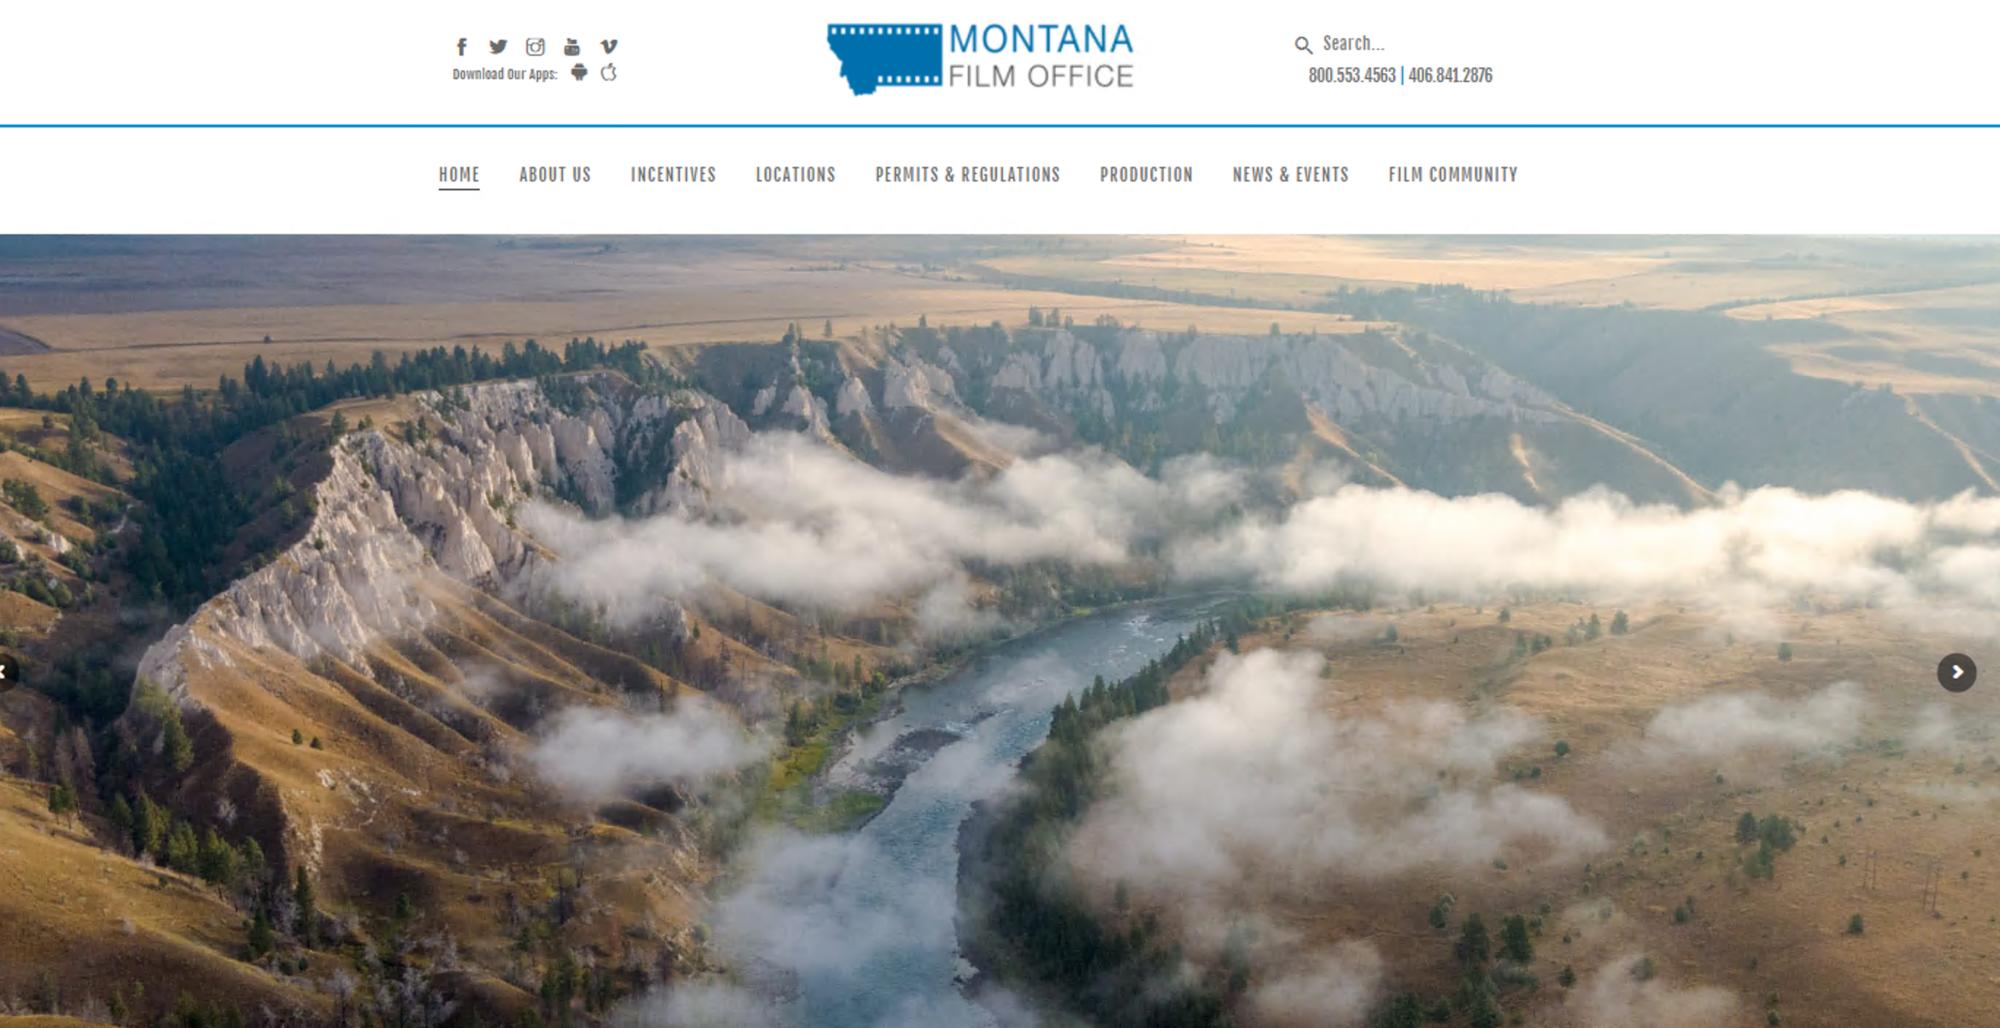 MFO Homepage